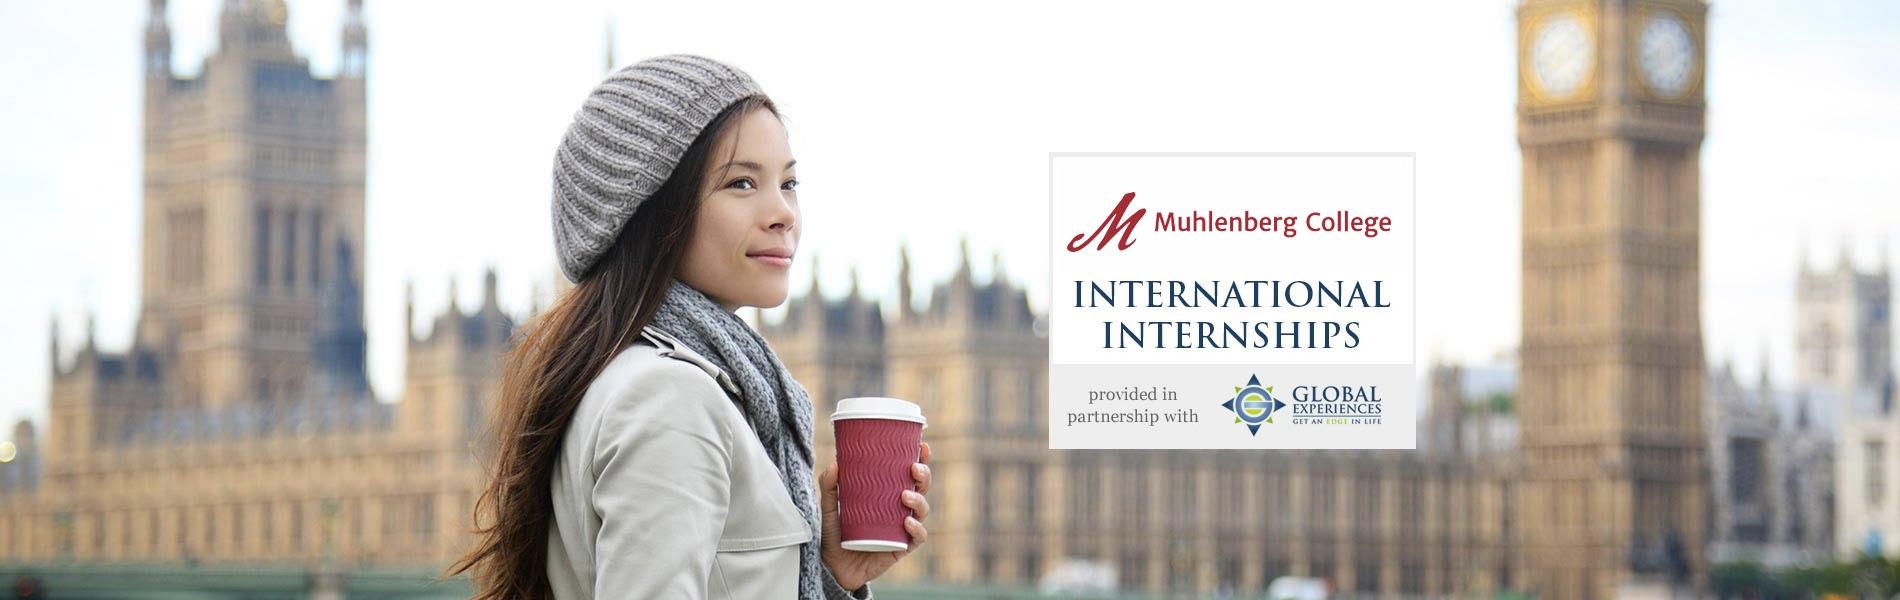 muhlenberg intern abroad